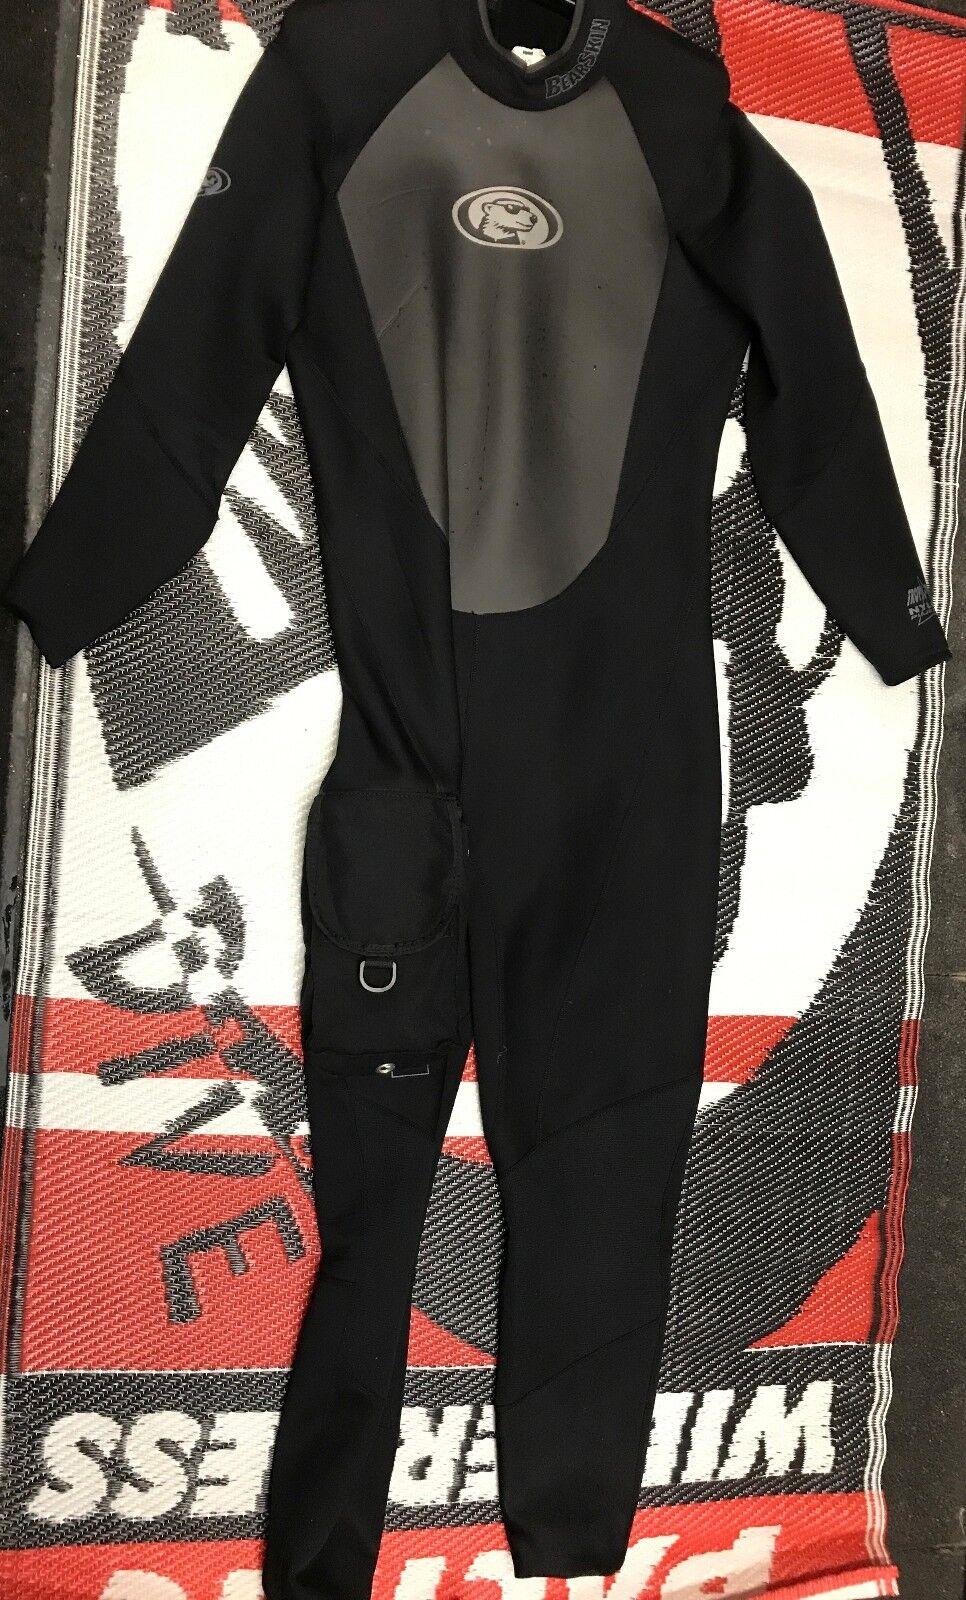 USED Men's Bearskin 3 2mm Wetsuit